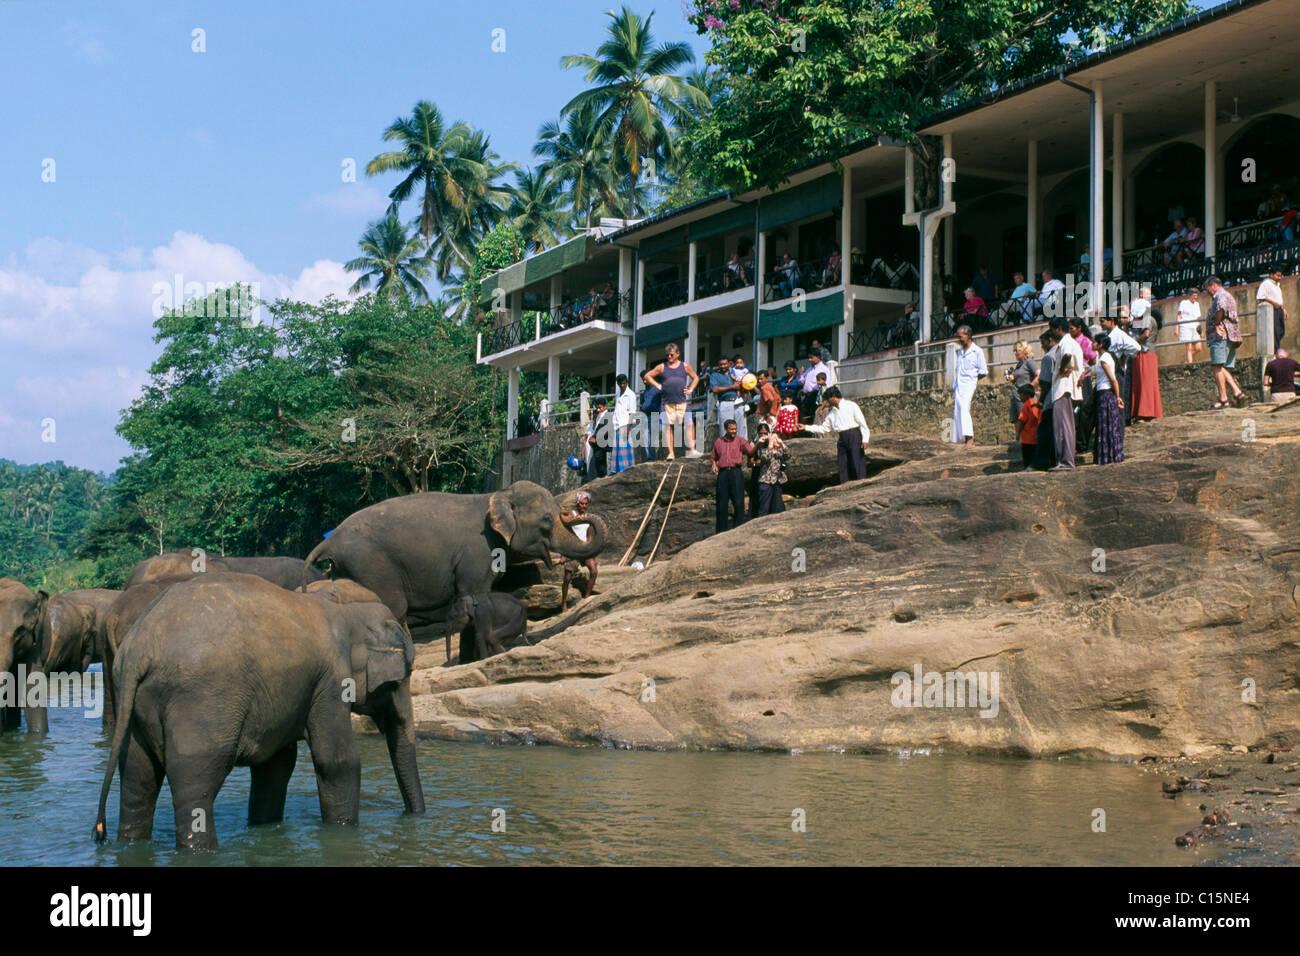 Elephants (Elephantidae) in the Maha Oya River at the elephant orphanage in Pinnawela, Sri Lanka, Asia - Stock Image